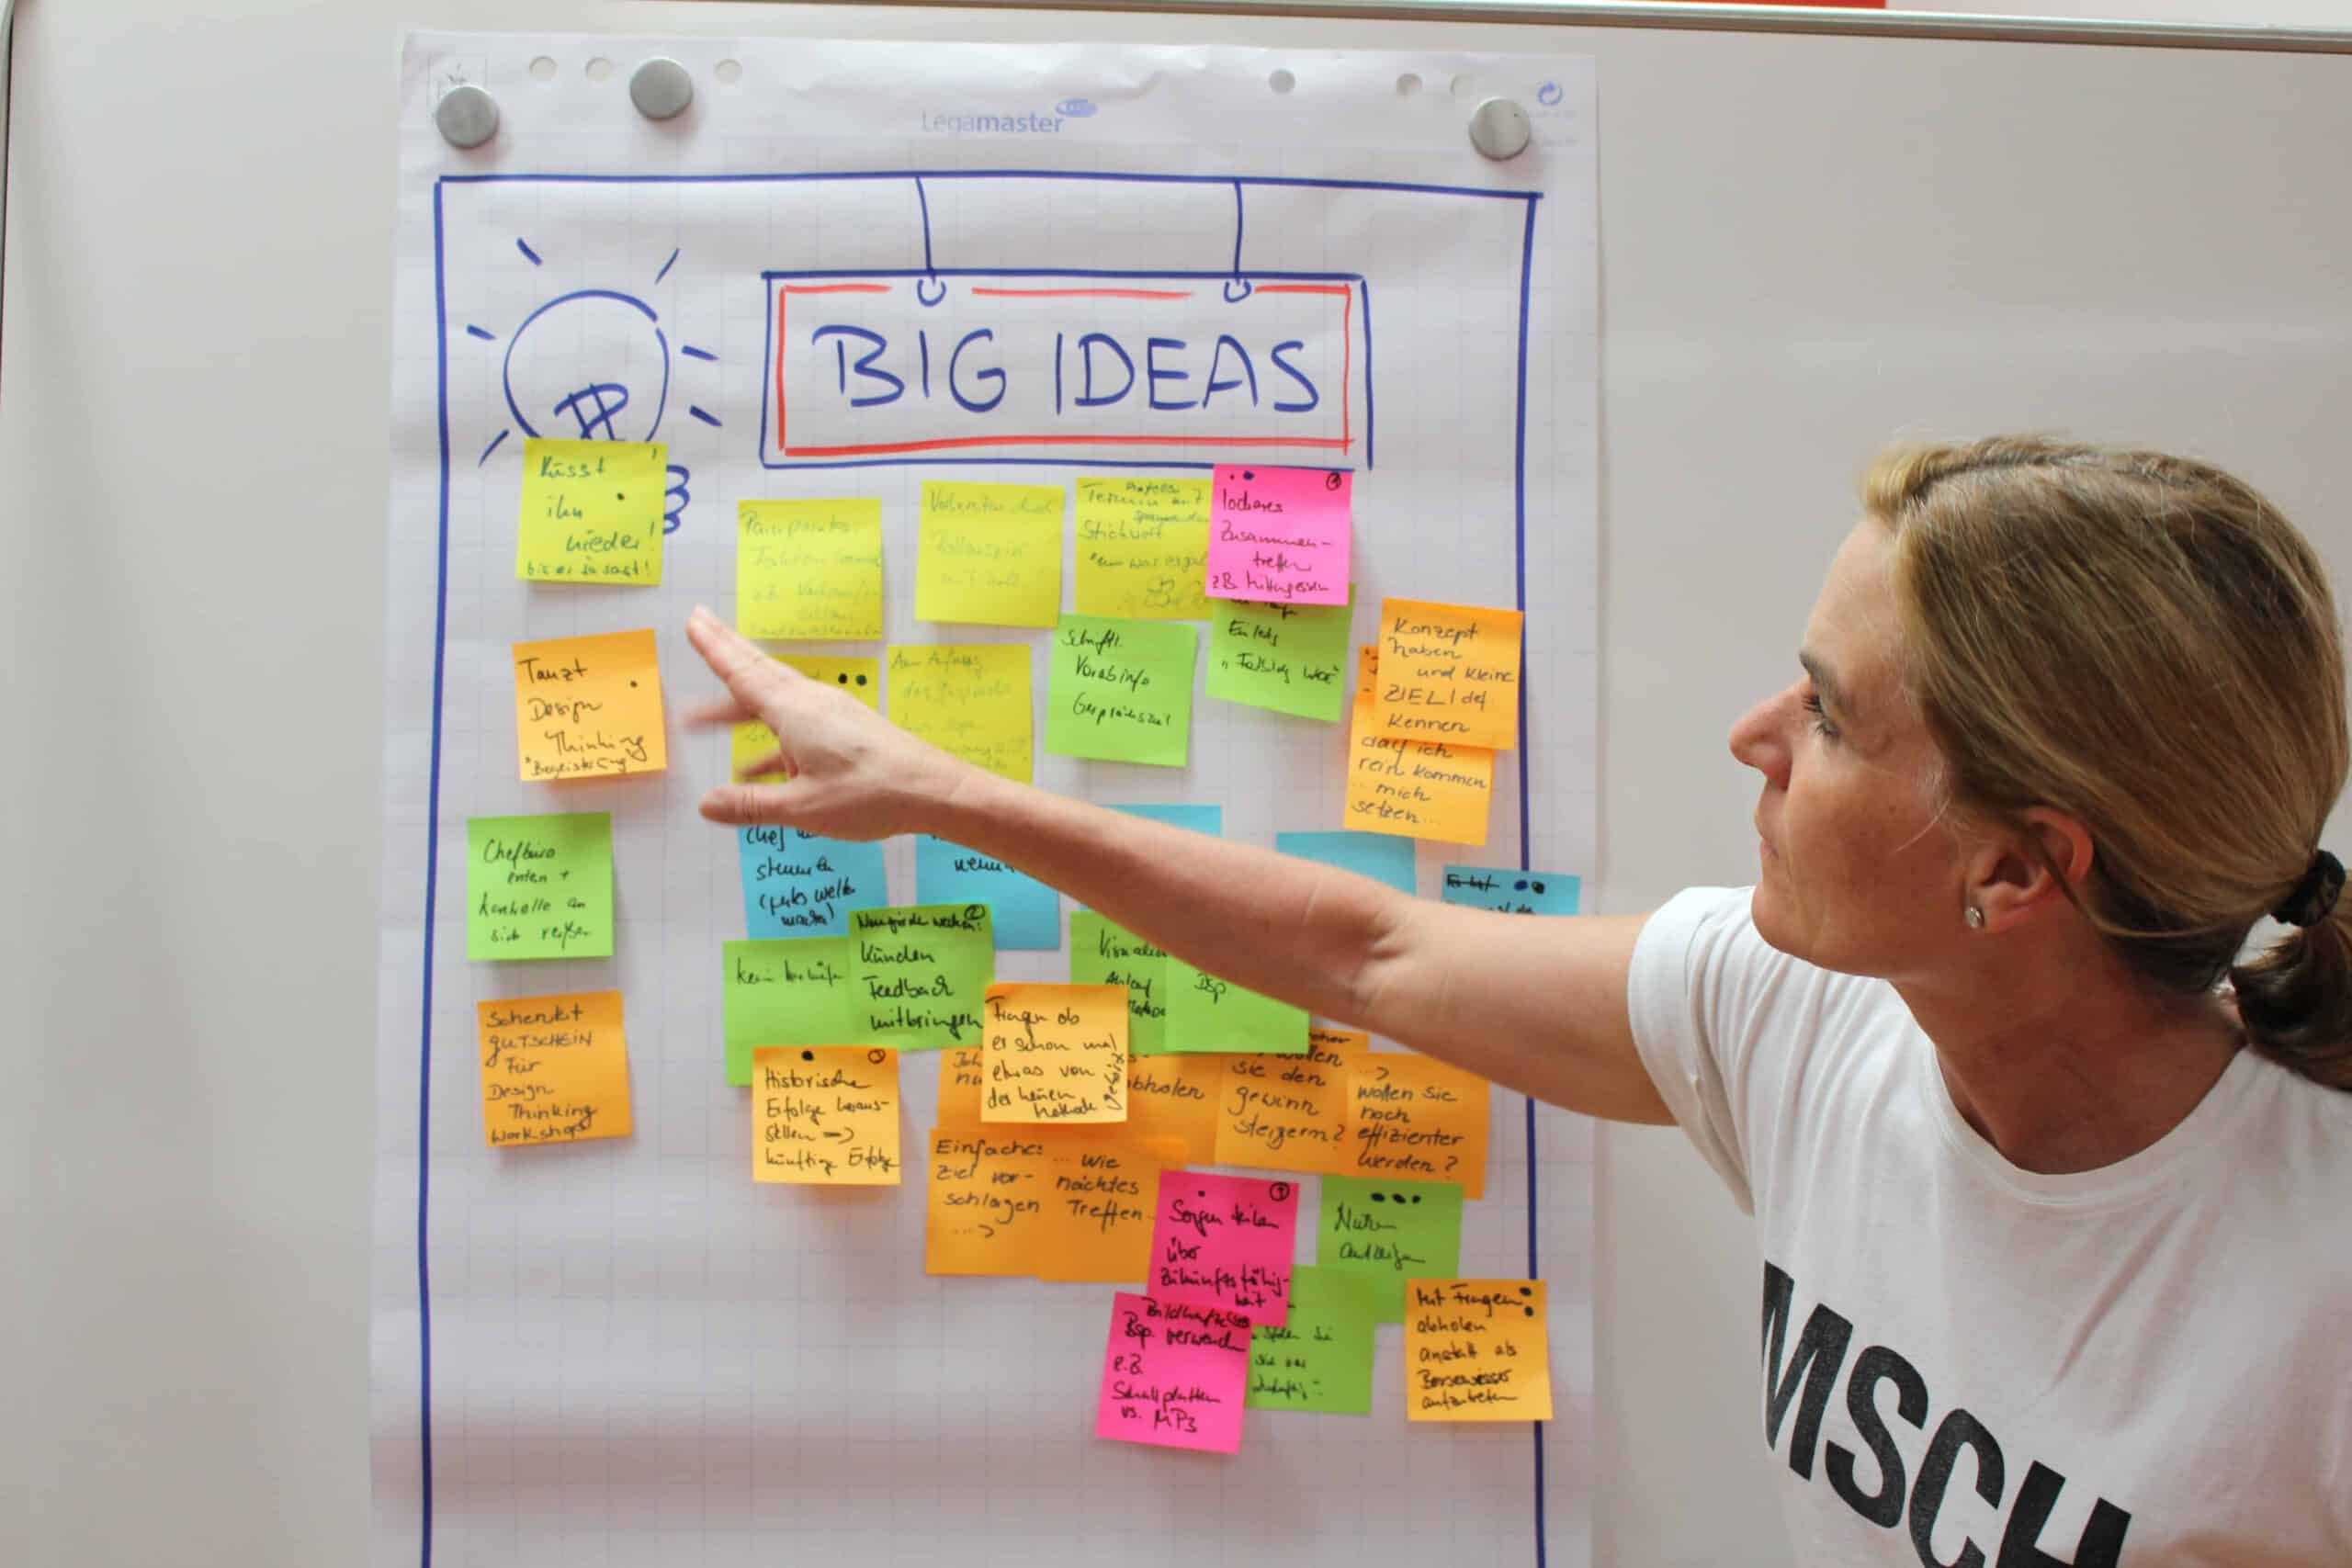 Sabine Woelflick erlaeutert Ideen am Flipchart